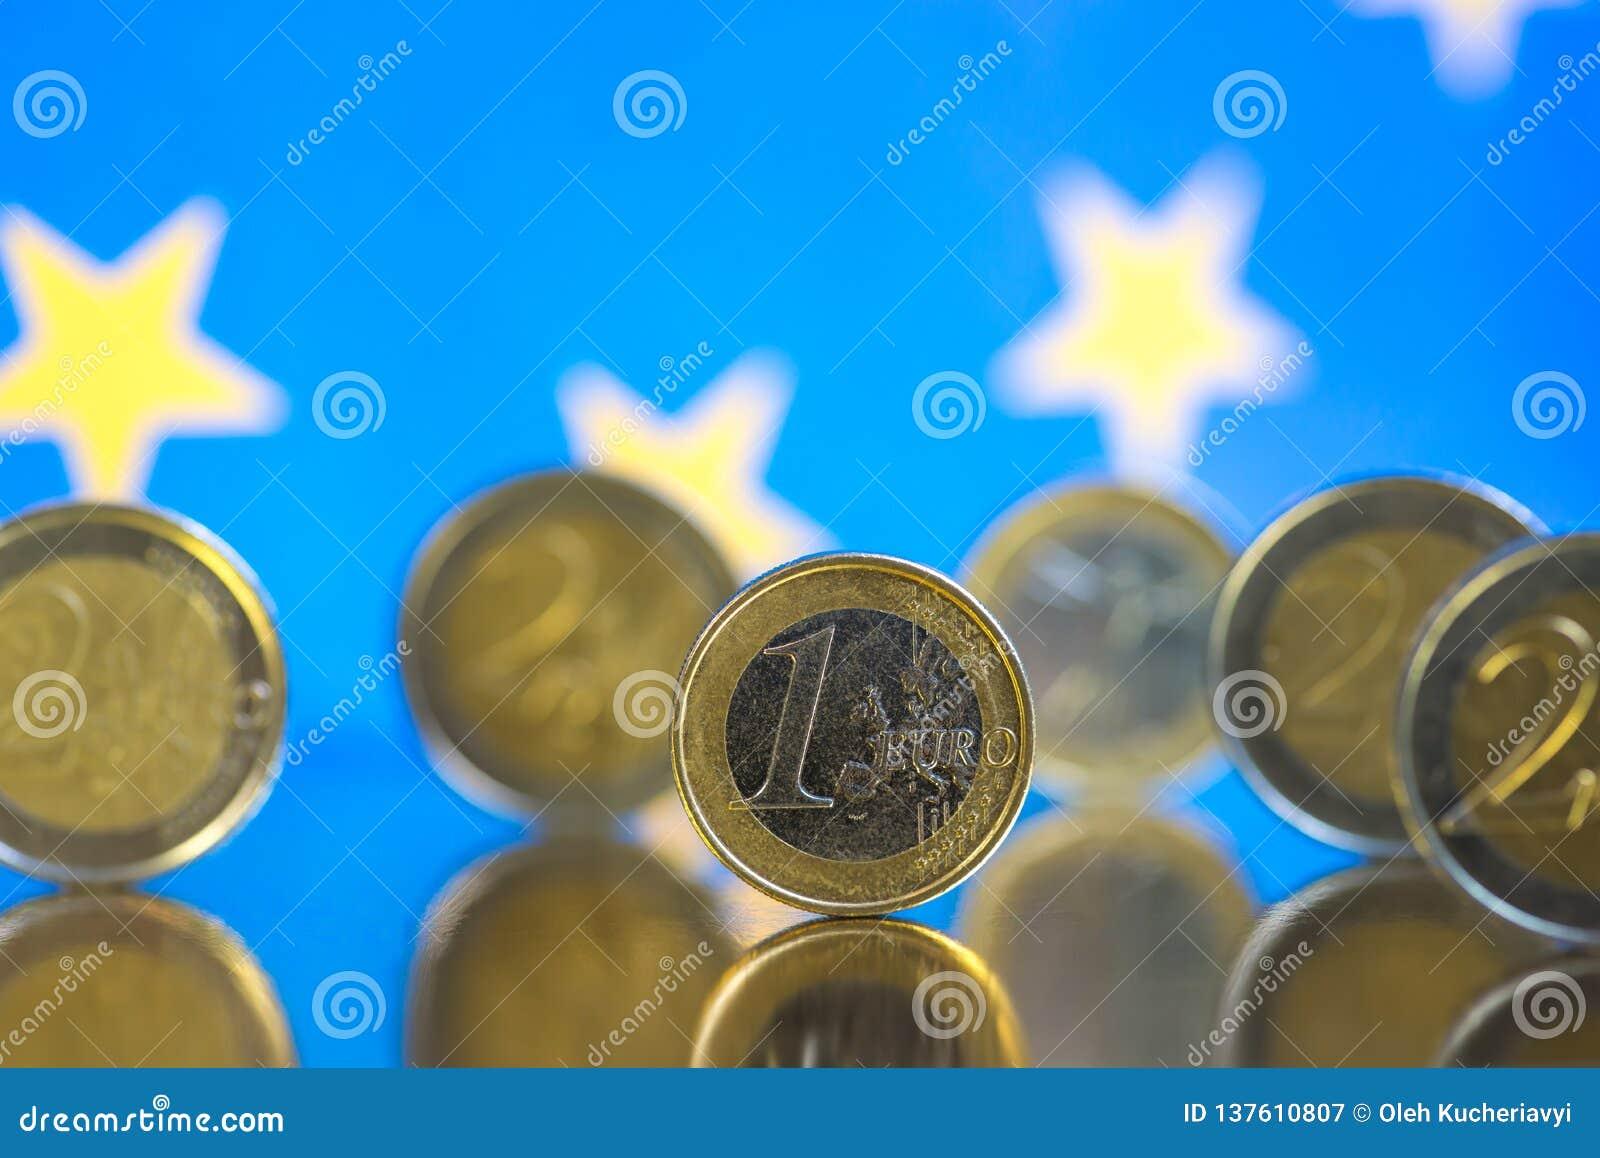 Euromynt p? en bl? bakgrund